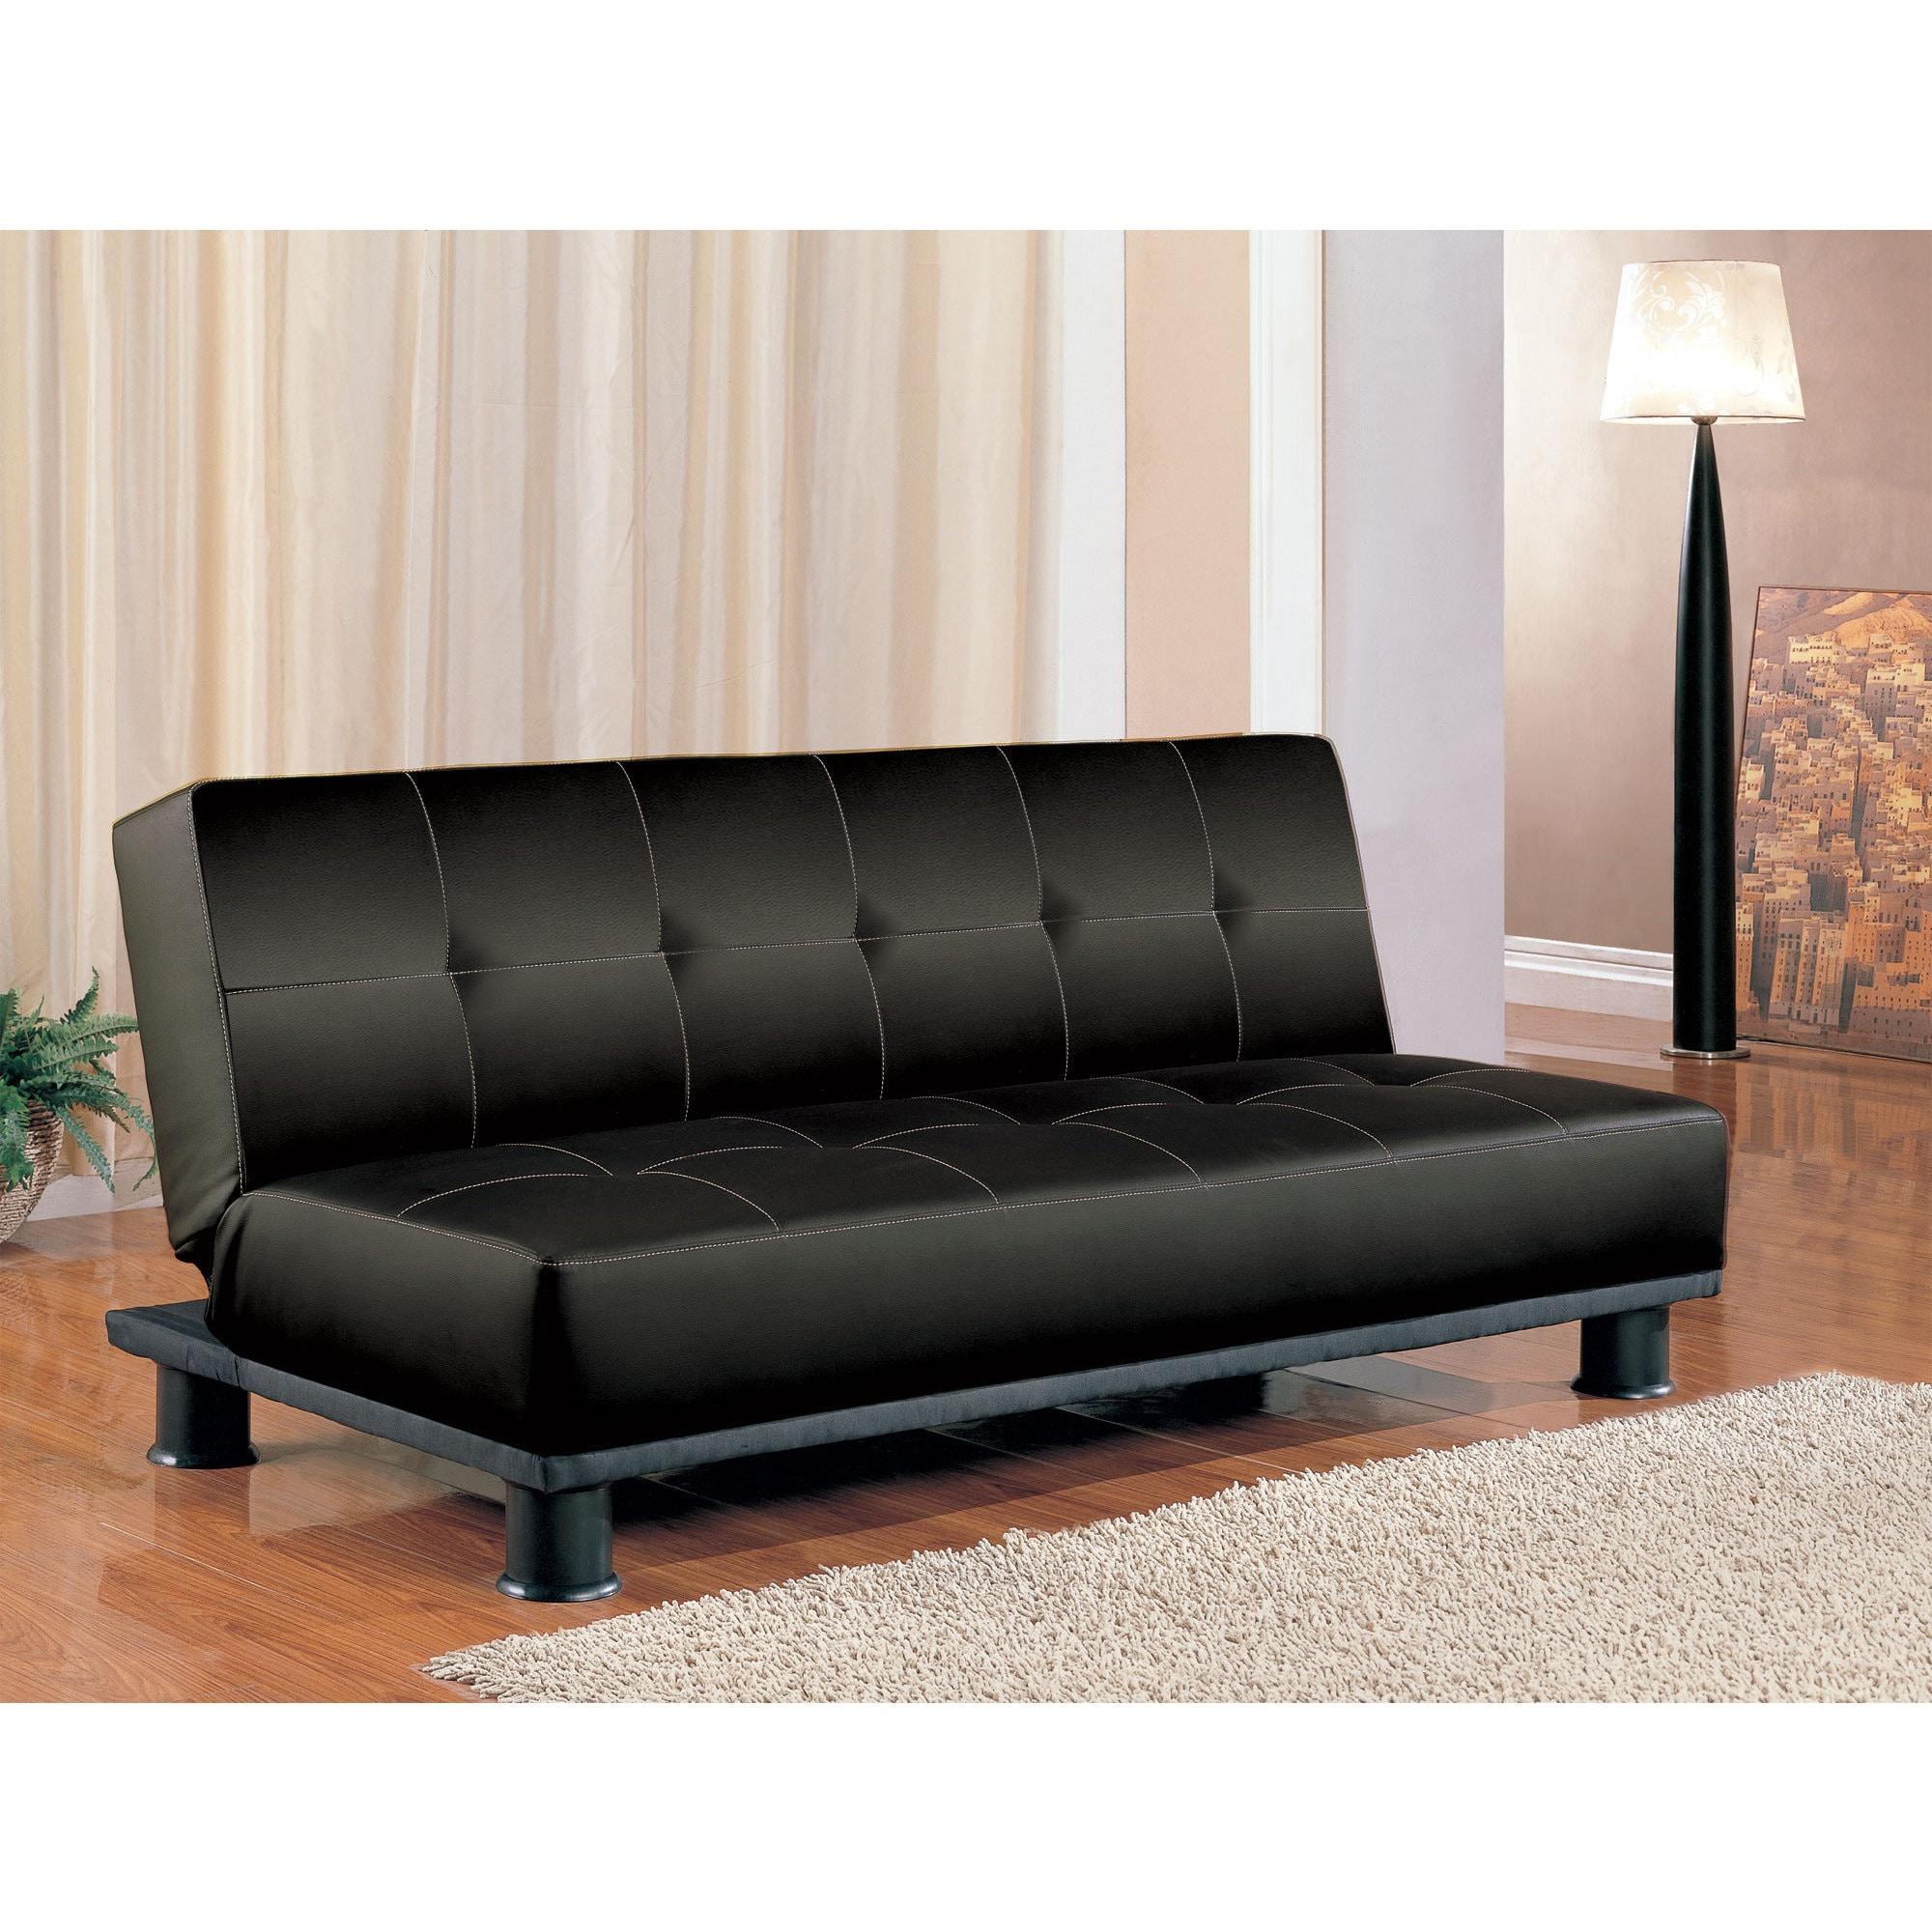 Coaster Company Black Faux Leather Sofa Bed 72 25 X 43 X Black 72 25 X 43 Ebay